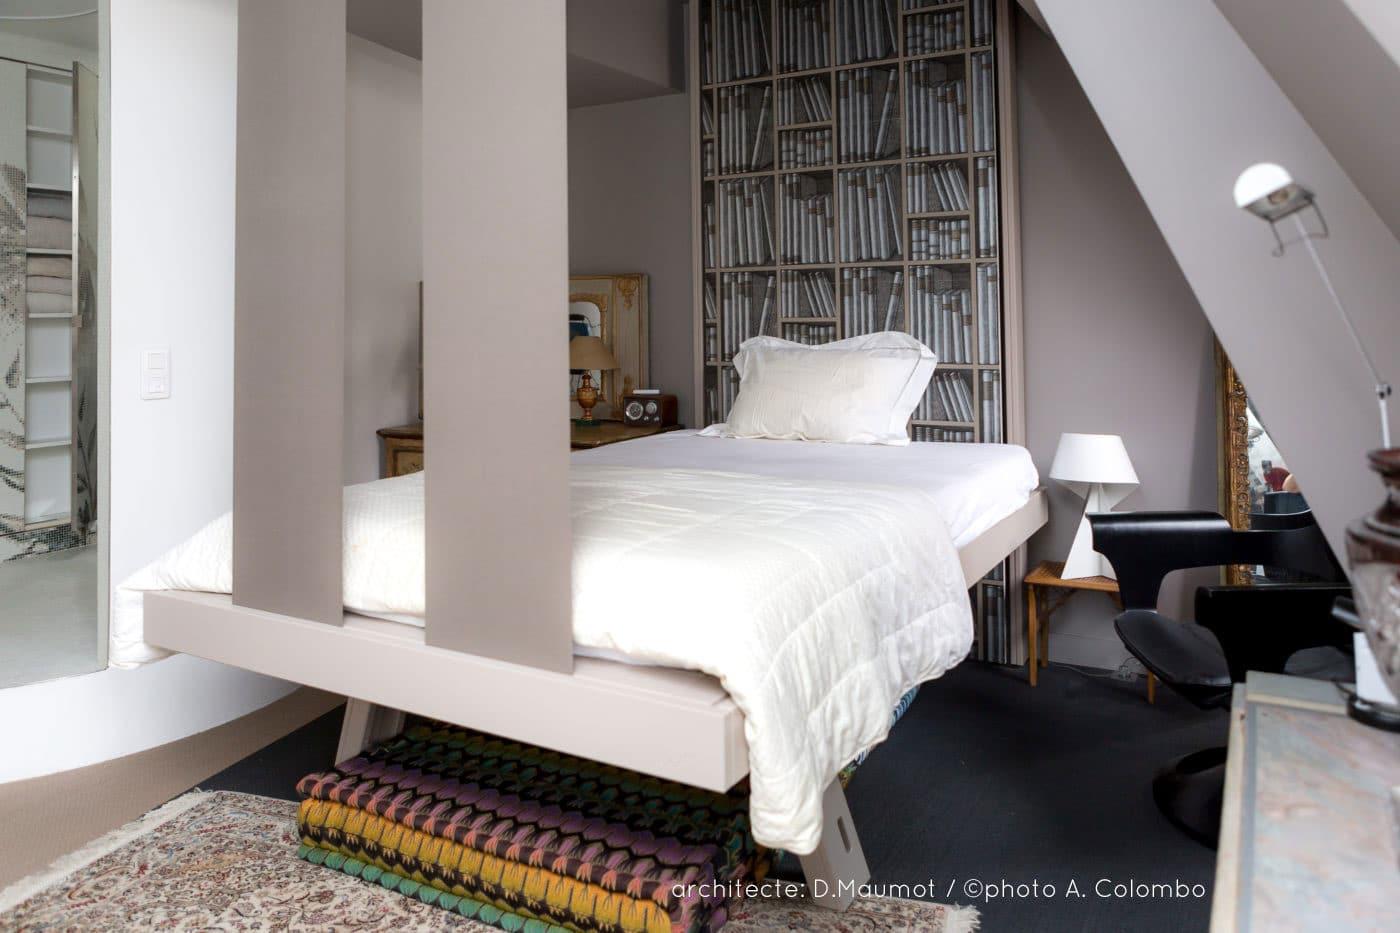 architecte: D. Maumot / ©photo: A.Colombo